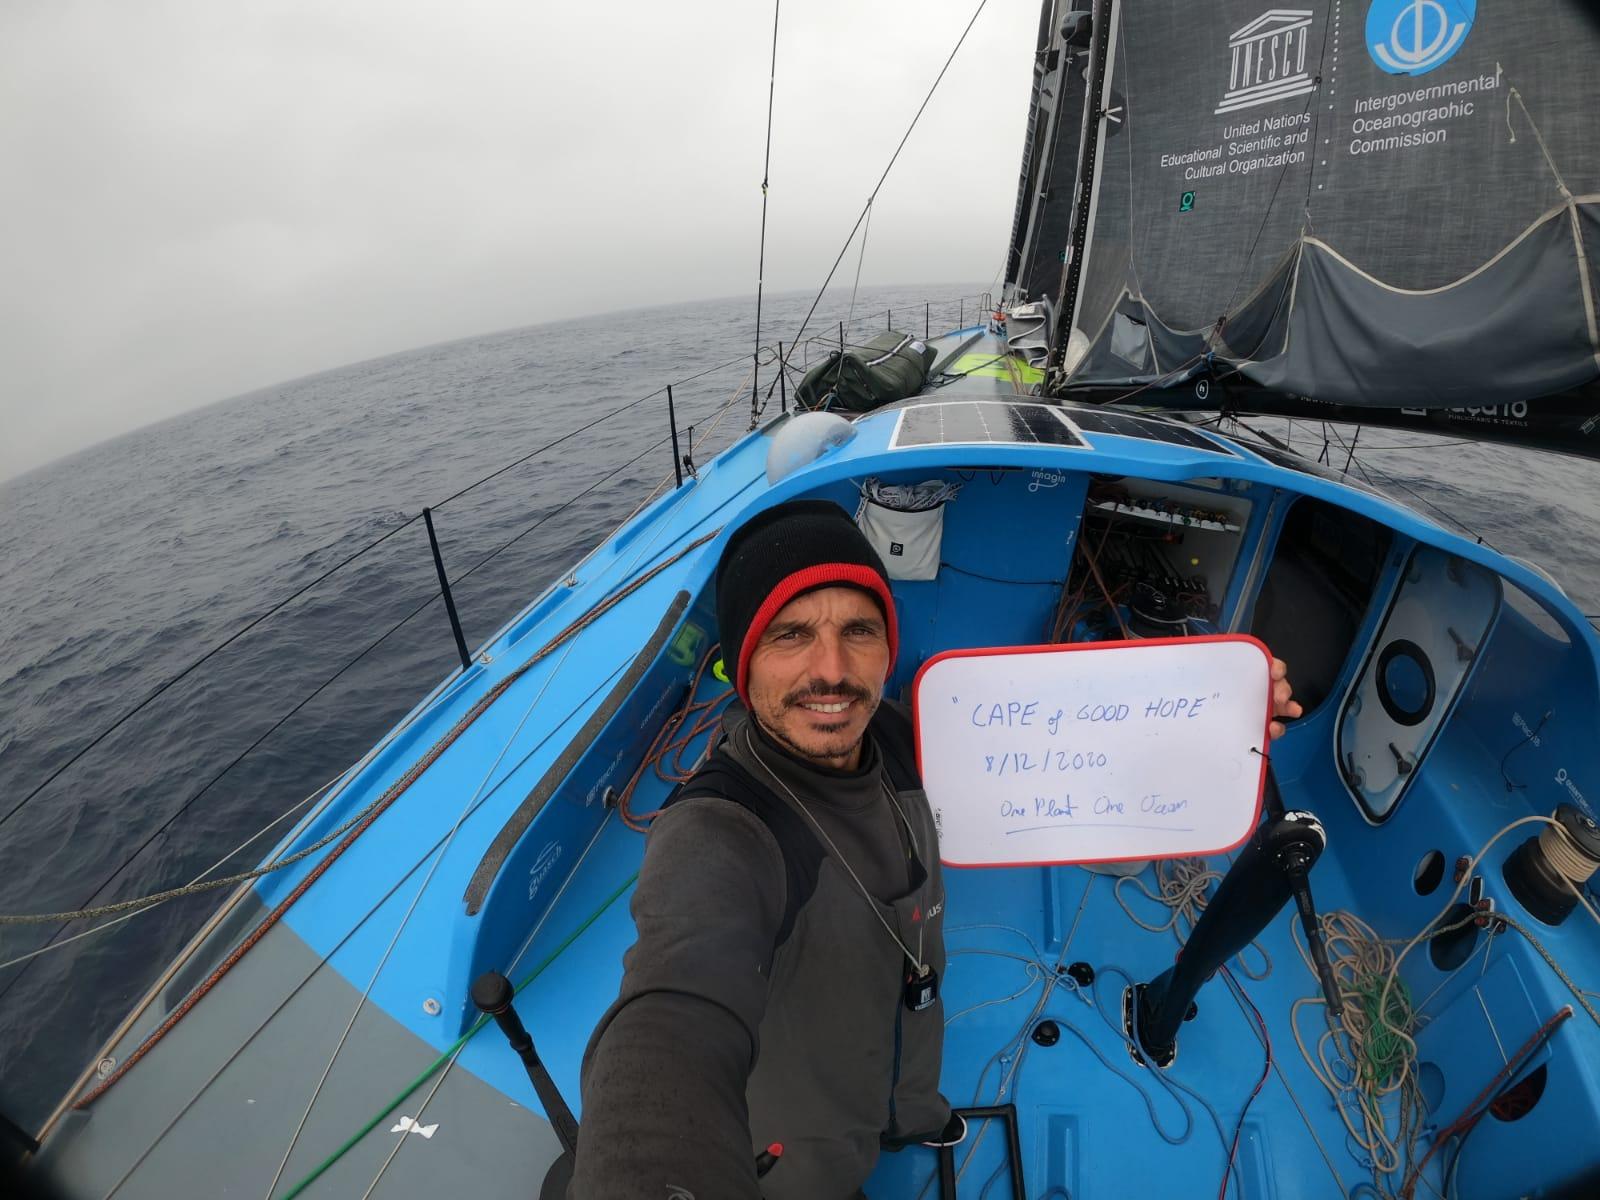 Didac Costa pasa el Cabo de Buena Esperanza a un mes de iniciar su segunda Vendée Globe